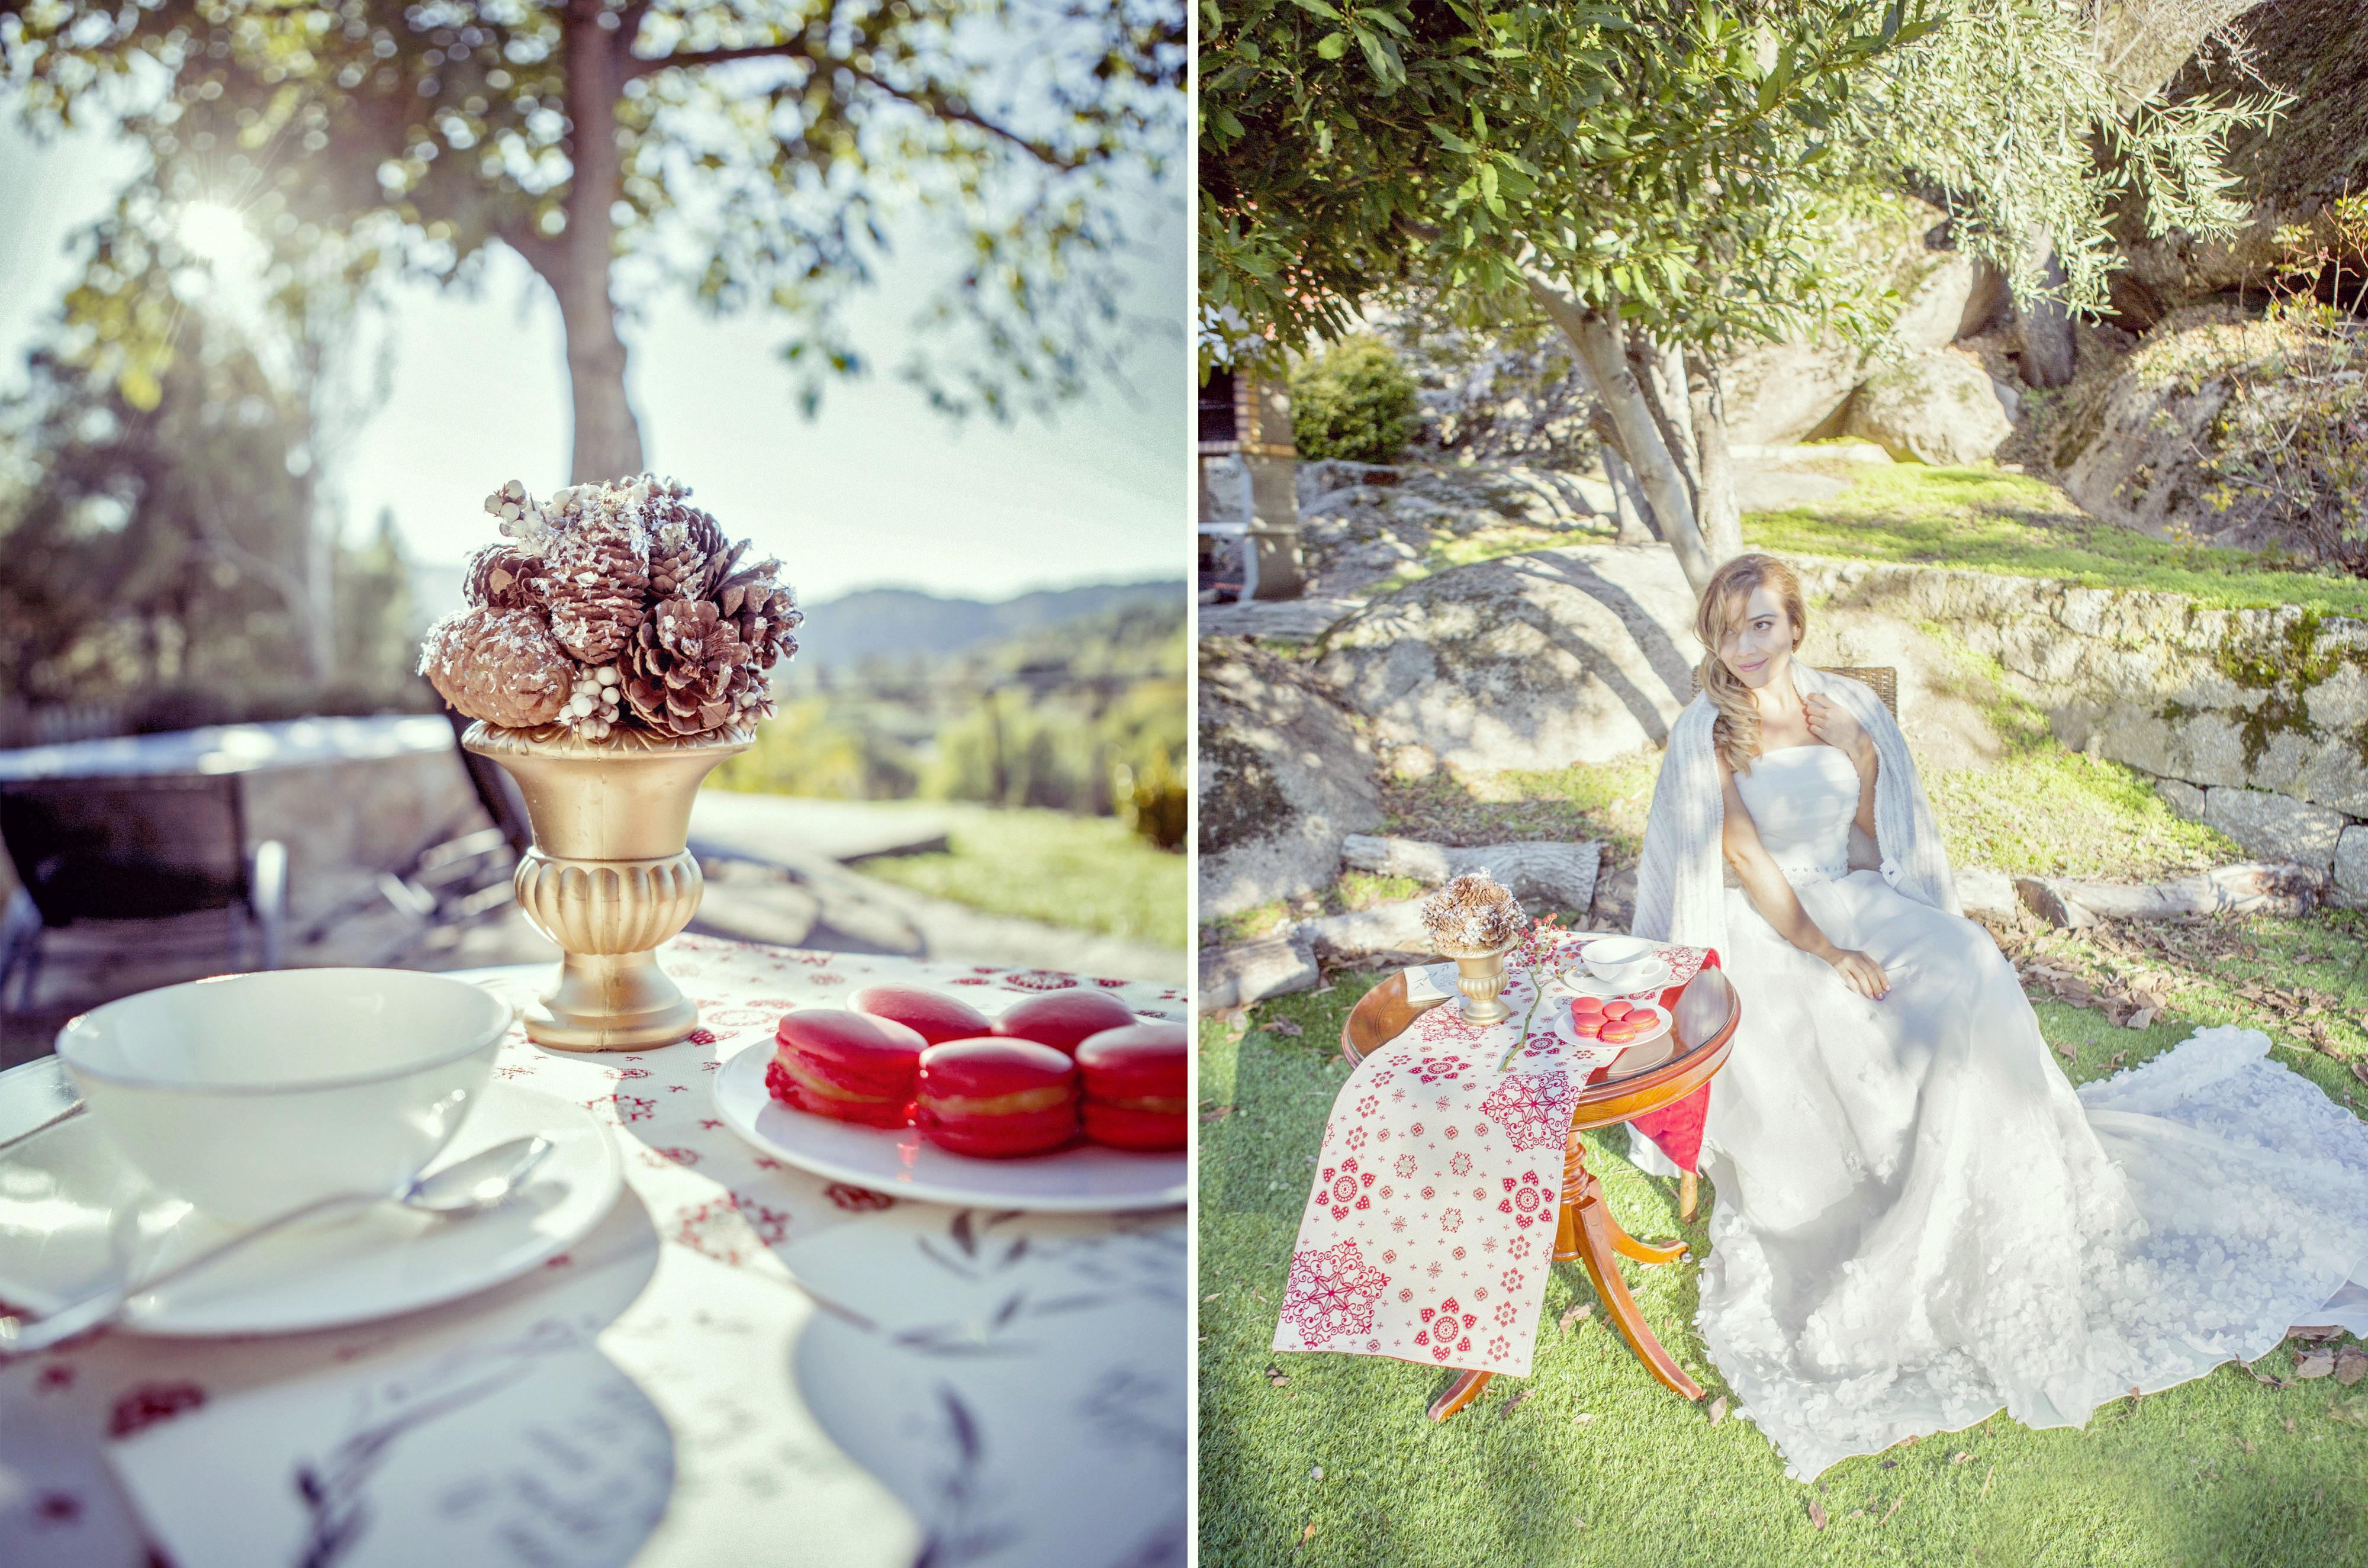 nataliaortizevents-wedding-planner-blog-de-moda-chic-adicta-boda-de-invierno-chic-adicta-tartas-madina-remezal-piensaenchic-piensa-en-chic